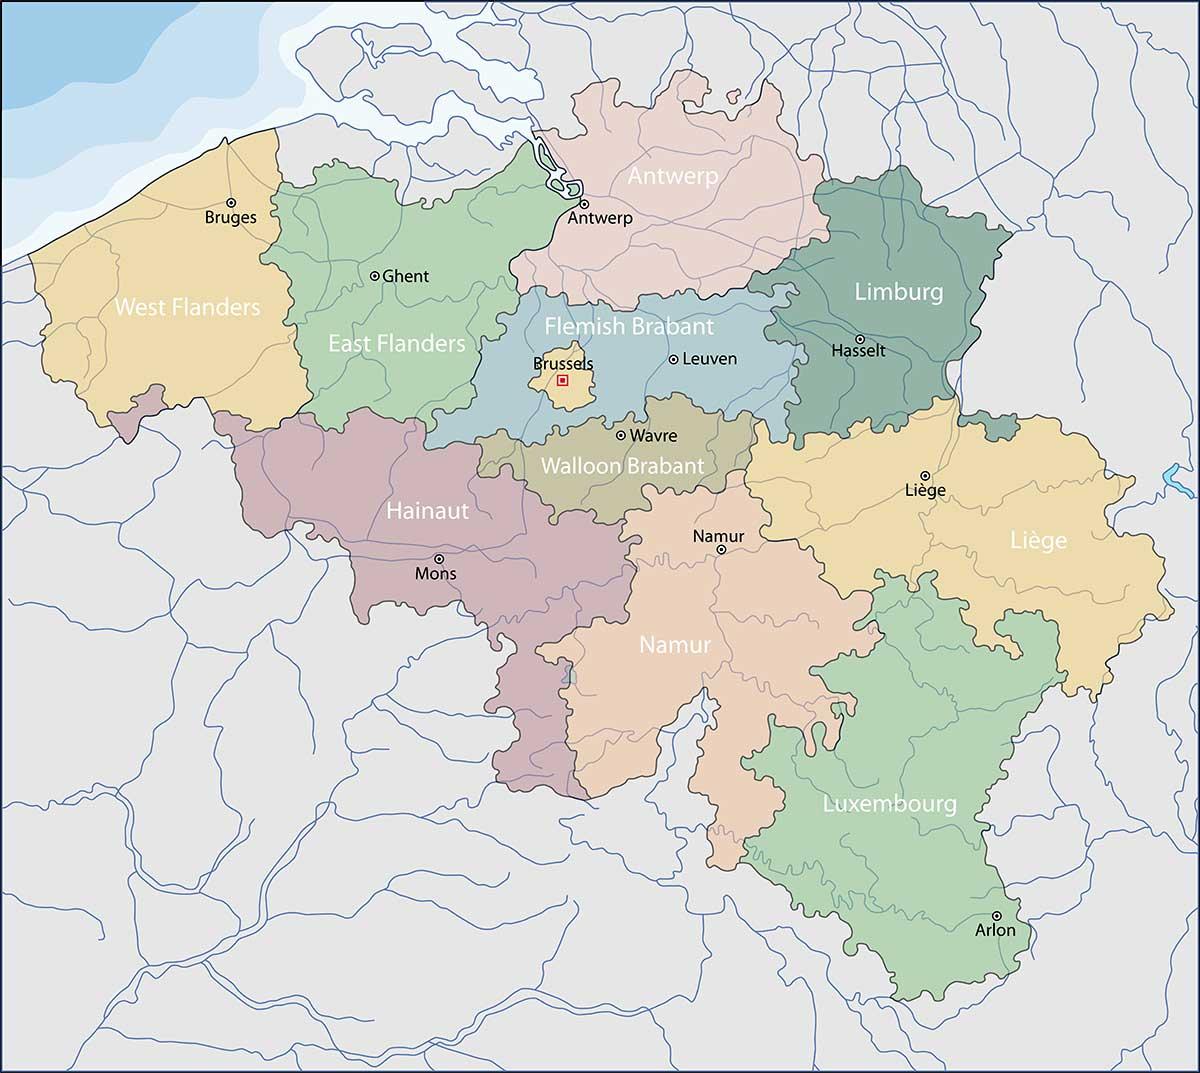 Cartina Fisica Belgio.Cartina Del Belgio Scarica Cartina Del Belgio In Alta Qualita Dati Da Europa